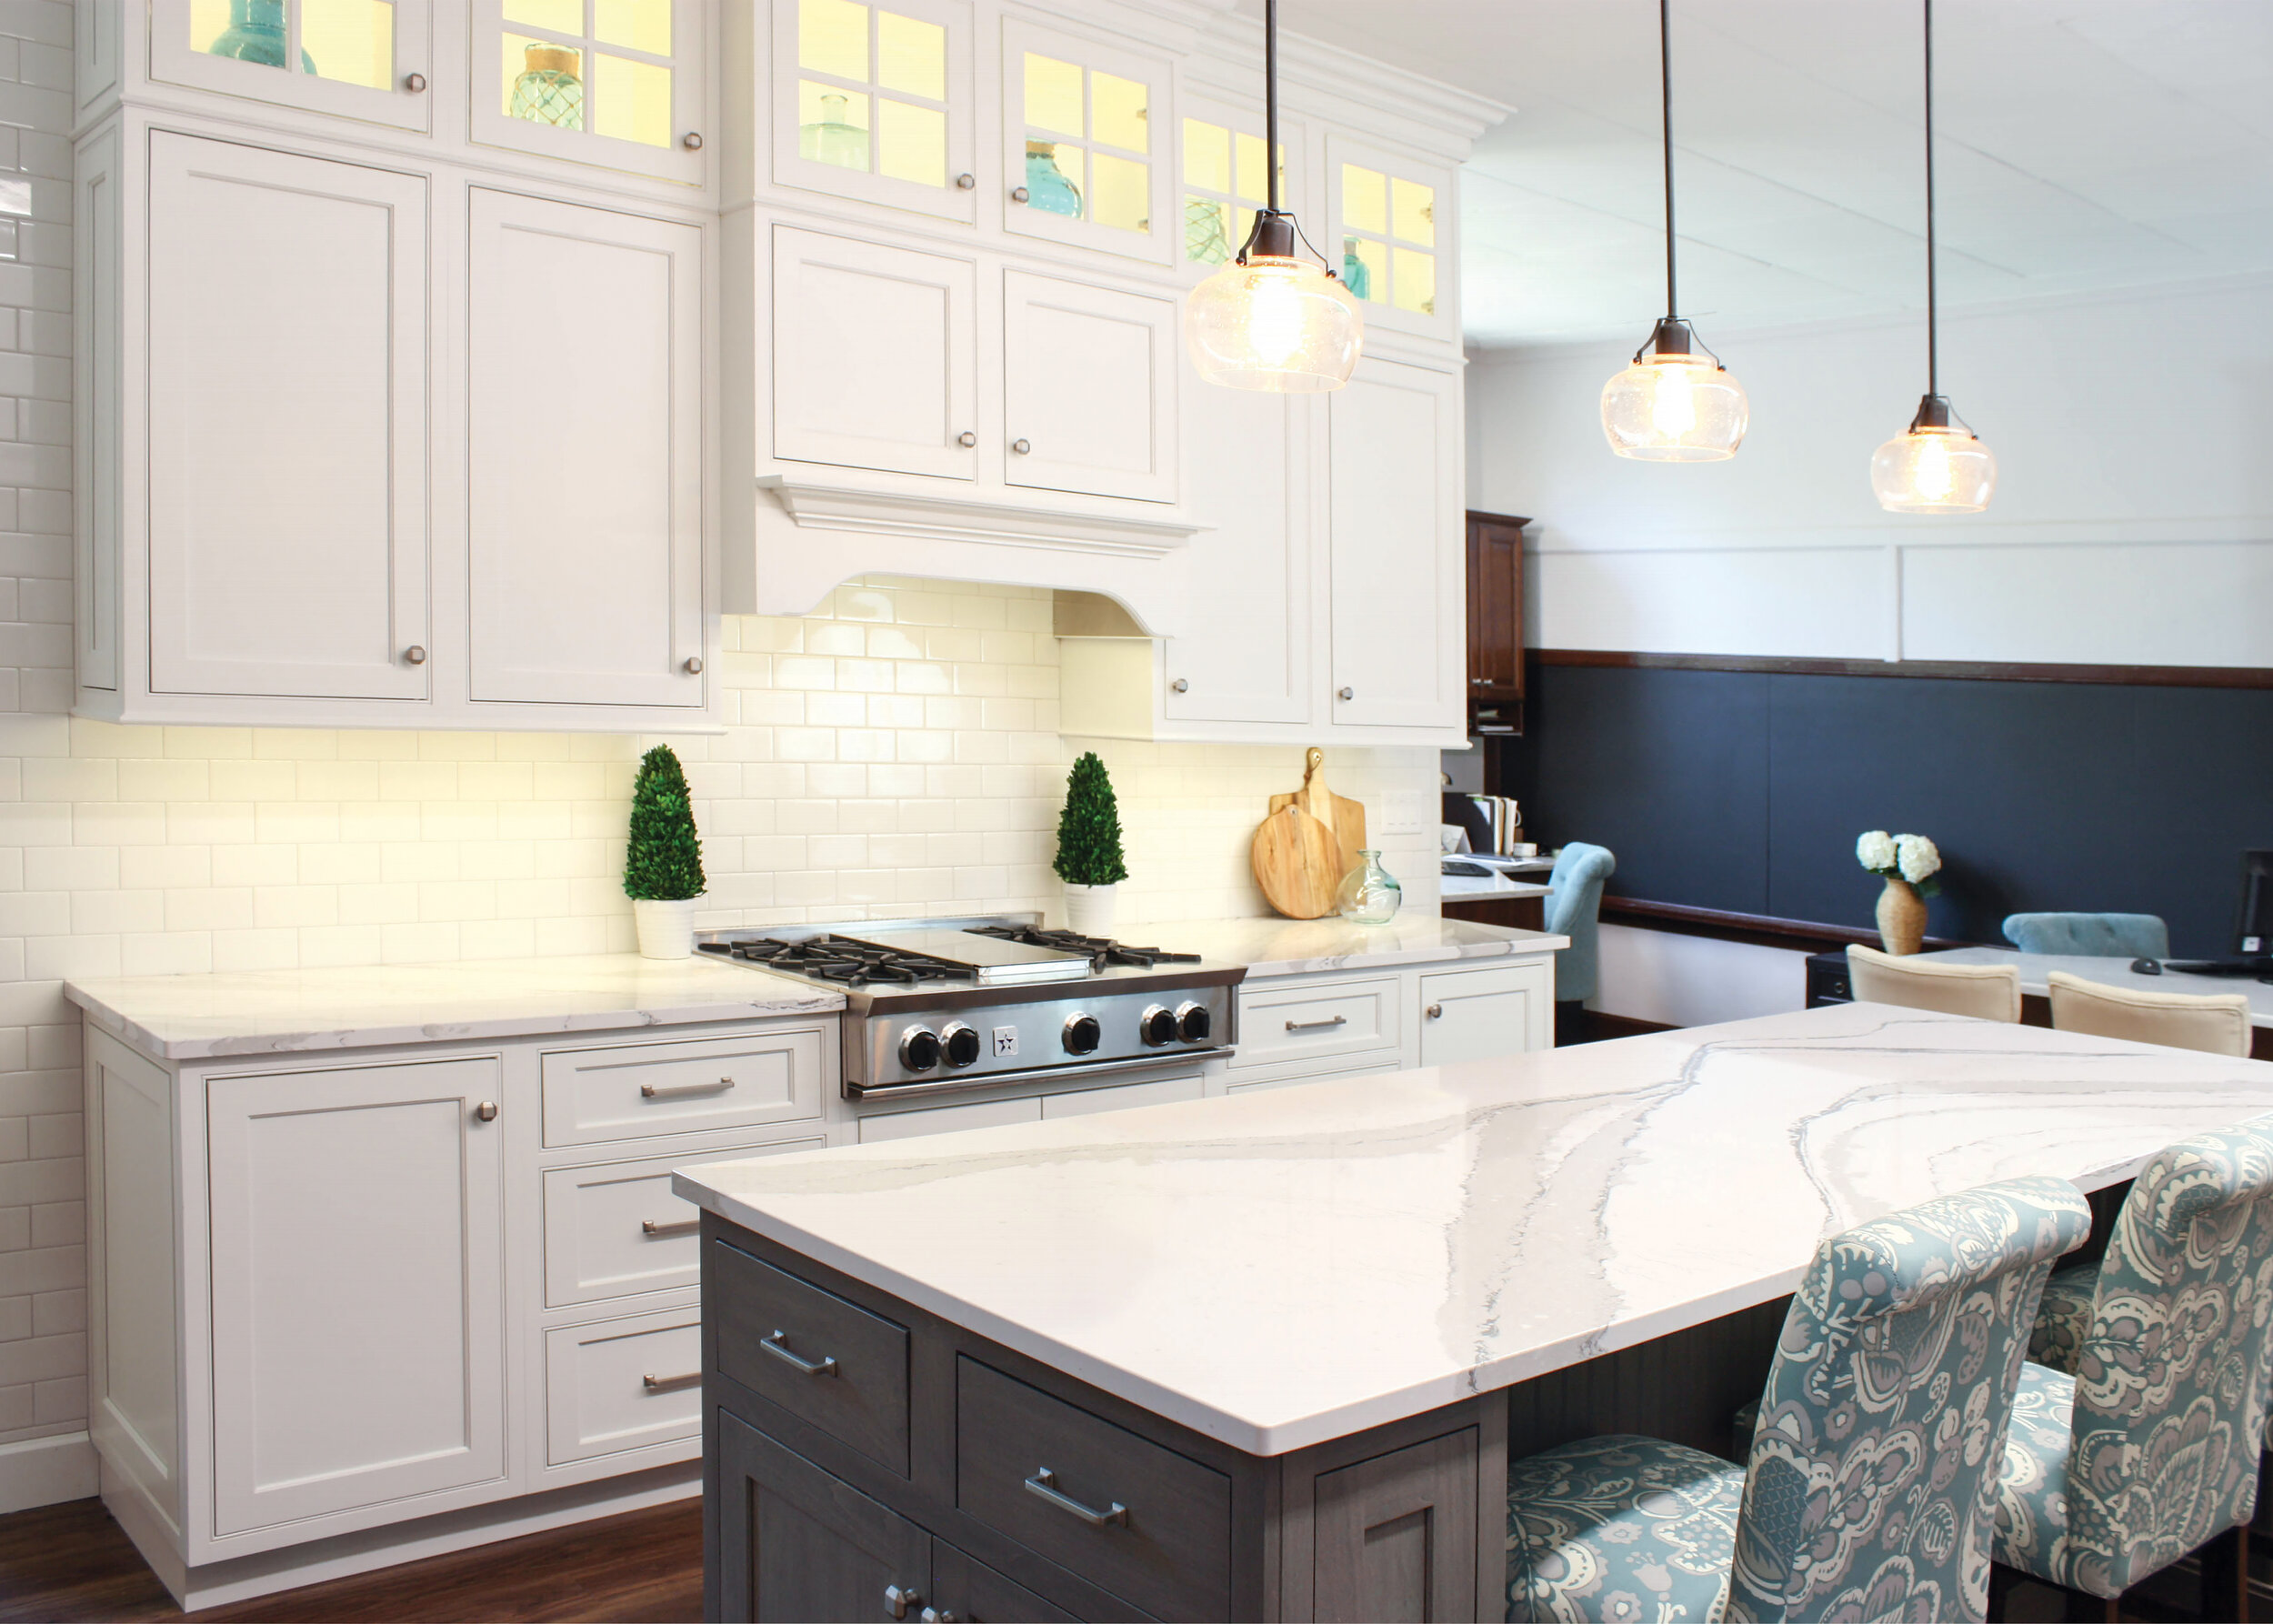 Southcoast Kitchen Designs - Carver, MA